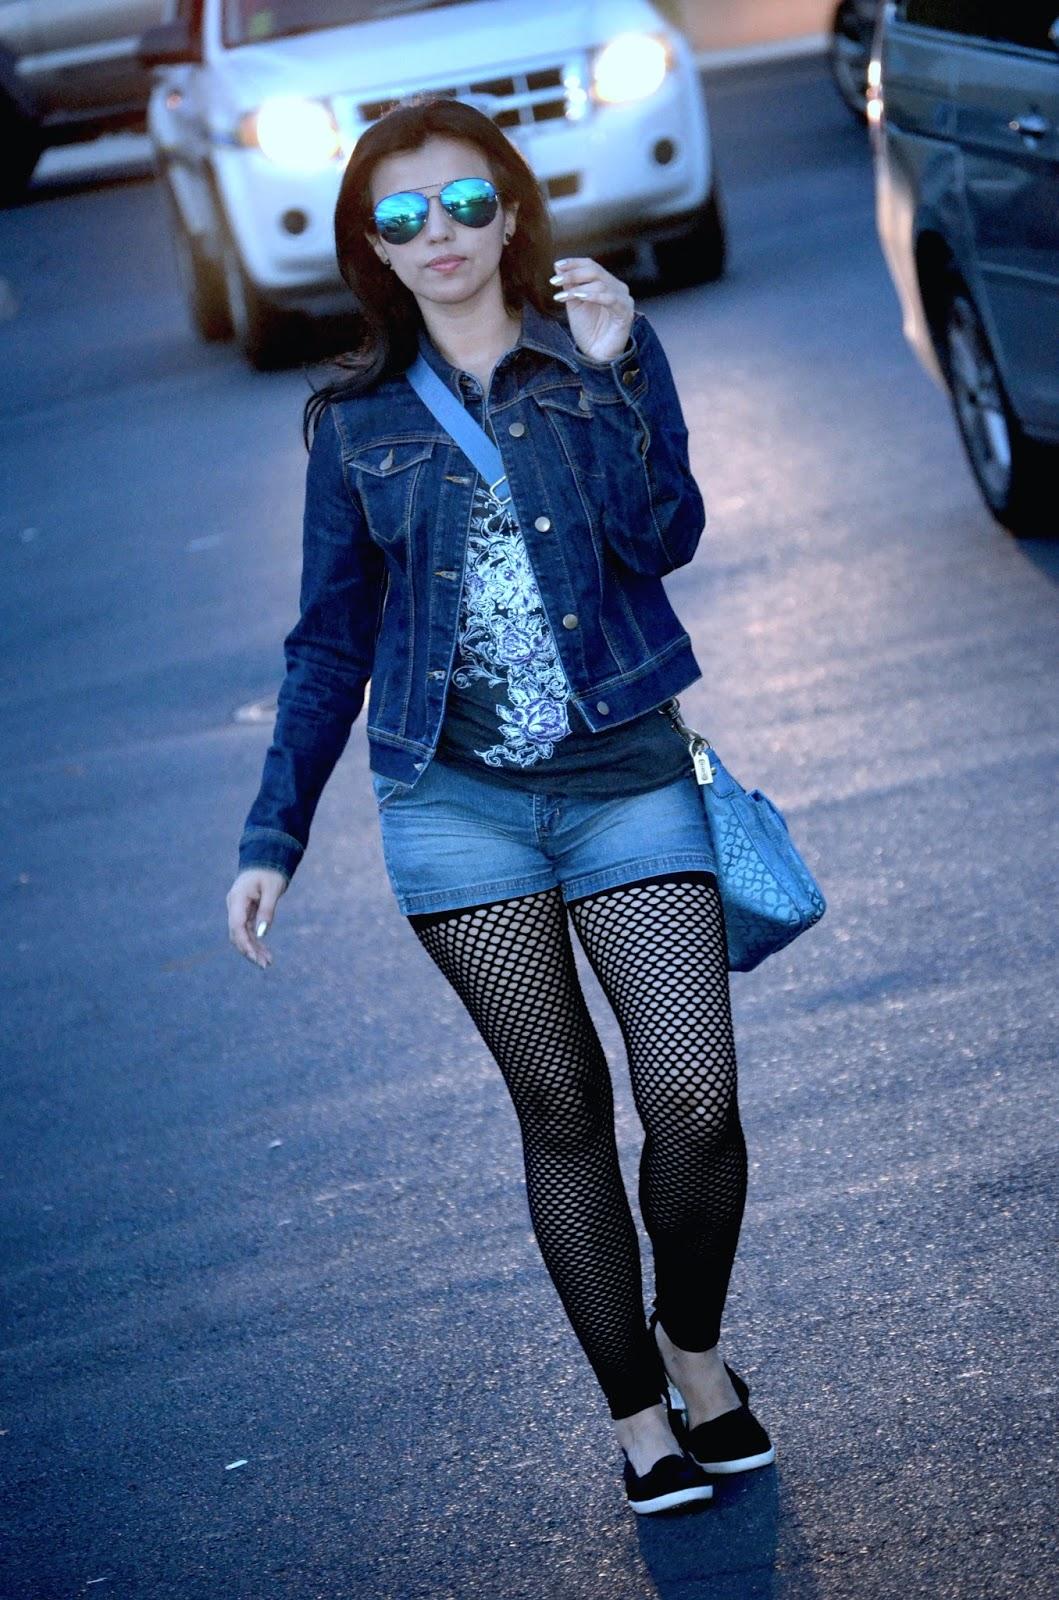 Punk Chic